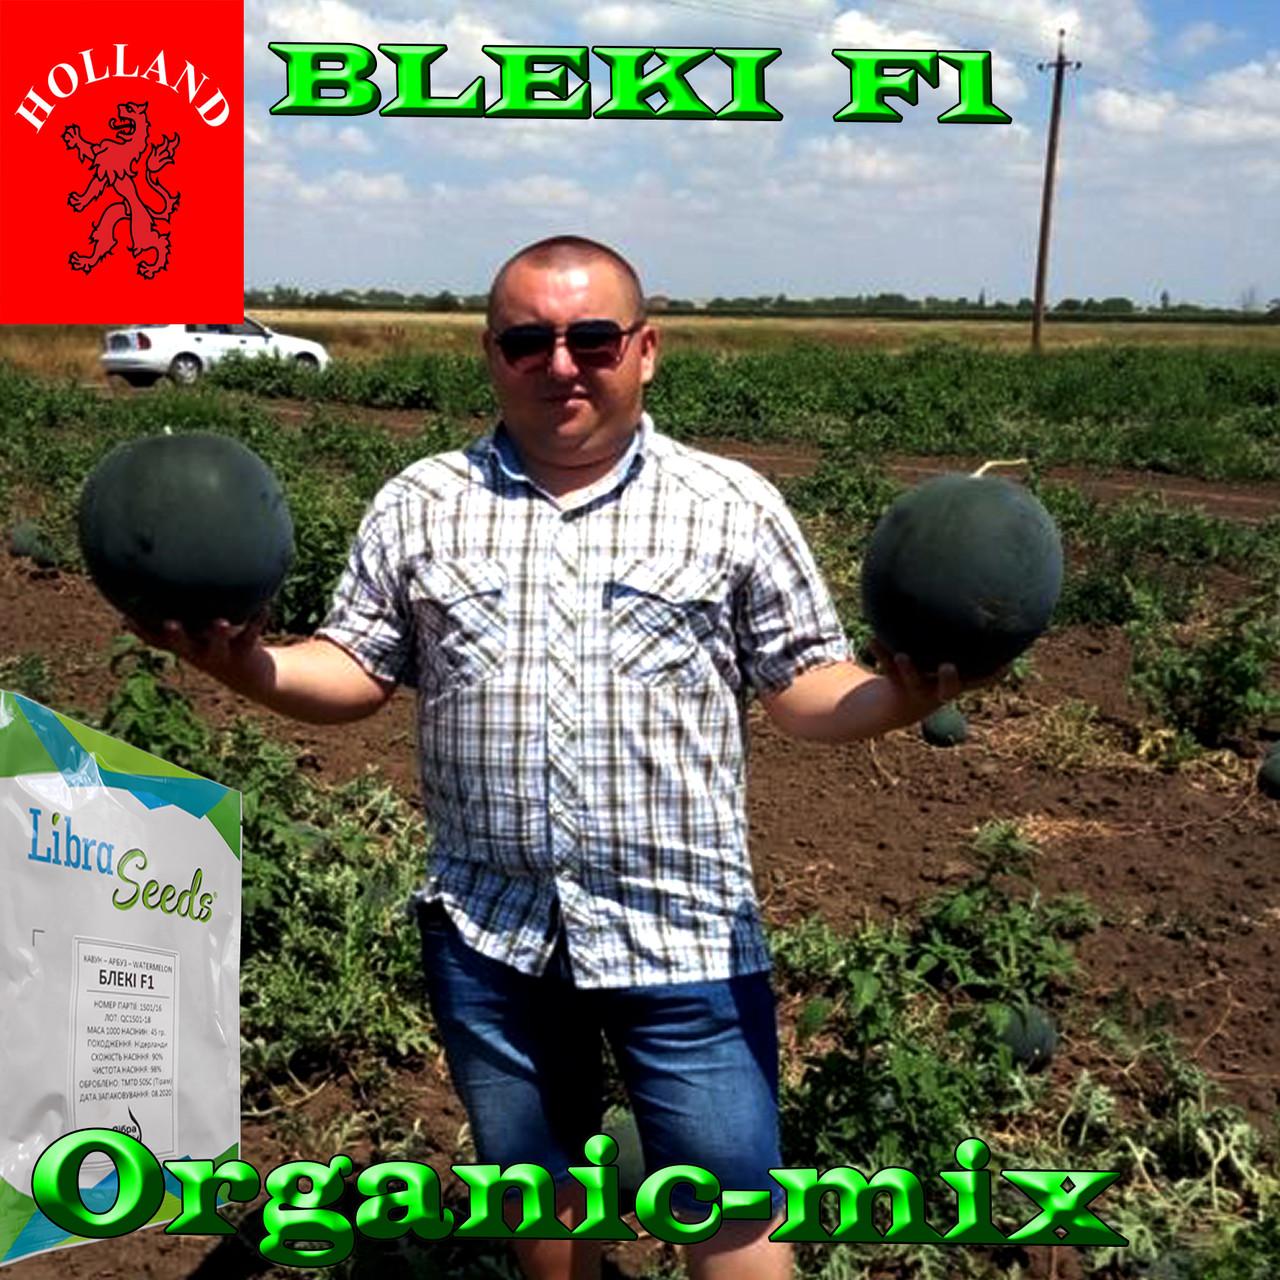 Семена, ранний, черный арбуз БЛЕЙК F1 / BLEKI F1, ТМ Libra Seeds (Голландия), 1000 семян